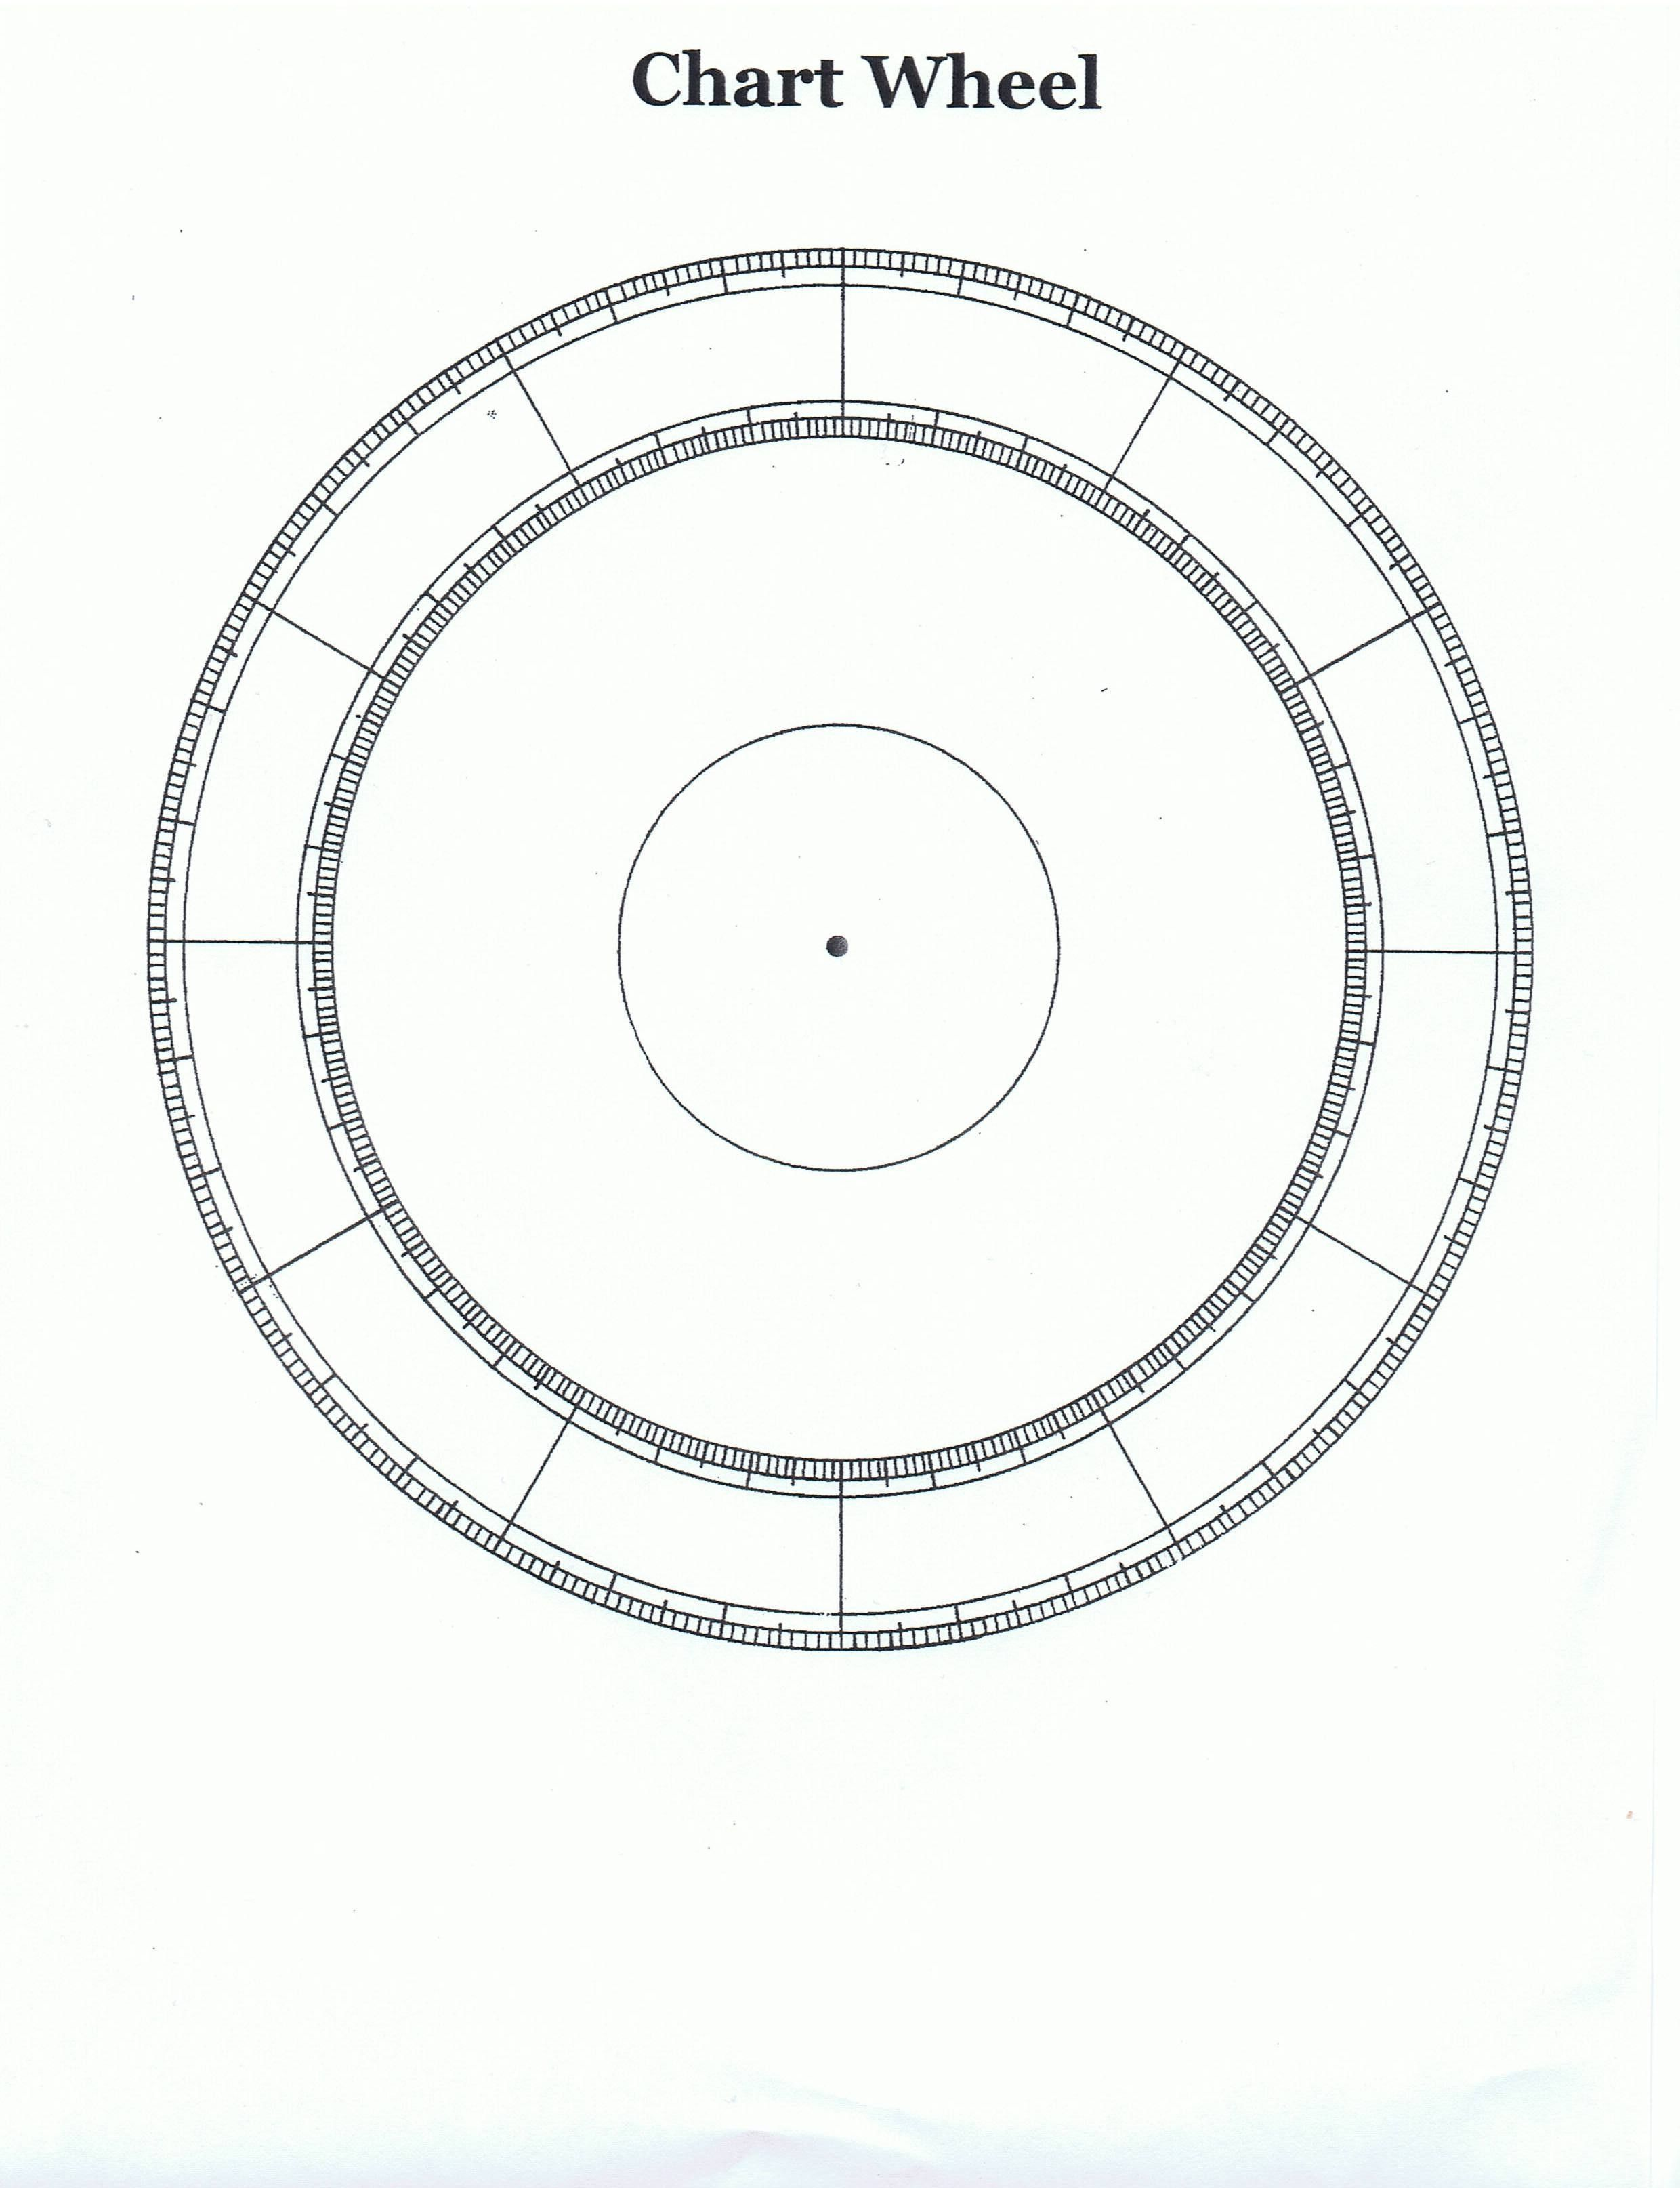 Blank Chart Wheel